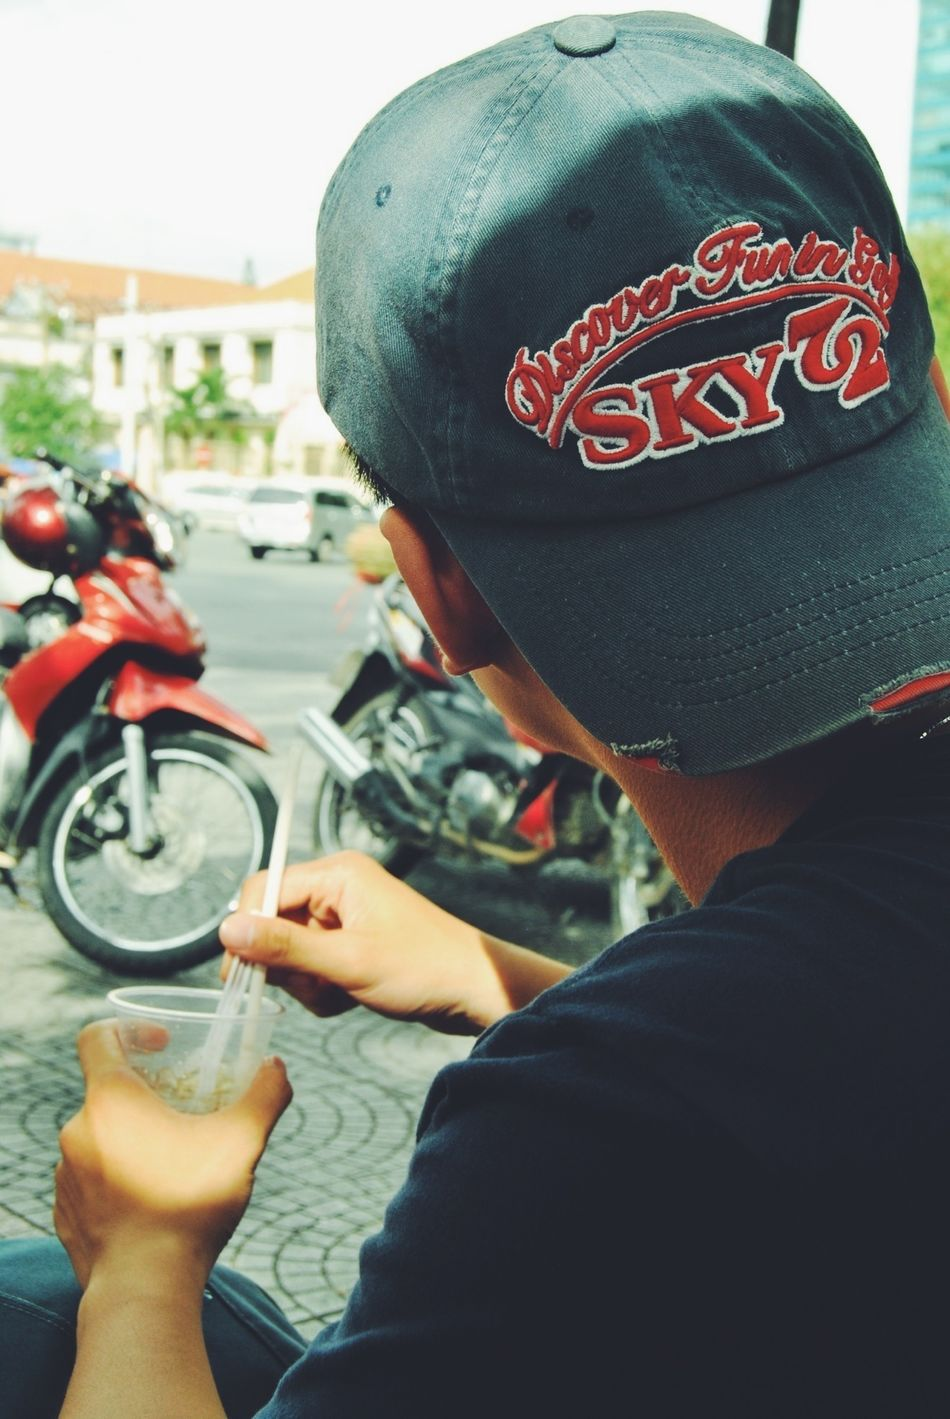 Thằng vé số (Chụp bởi: Lùn) #vscocam #saigon #coffee #caphebet EyeEm Best Shots Coffee Saigon Vscocam